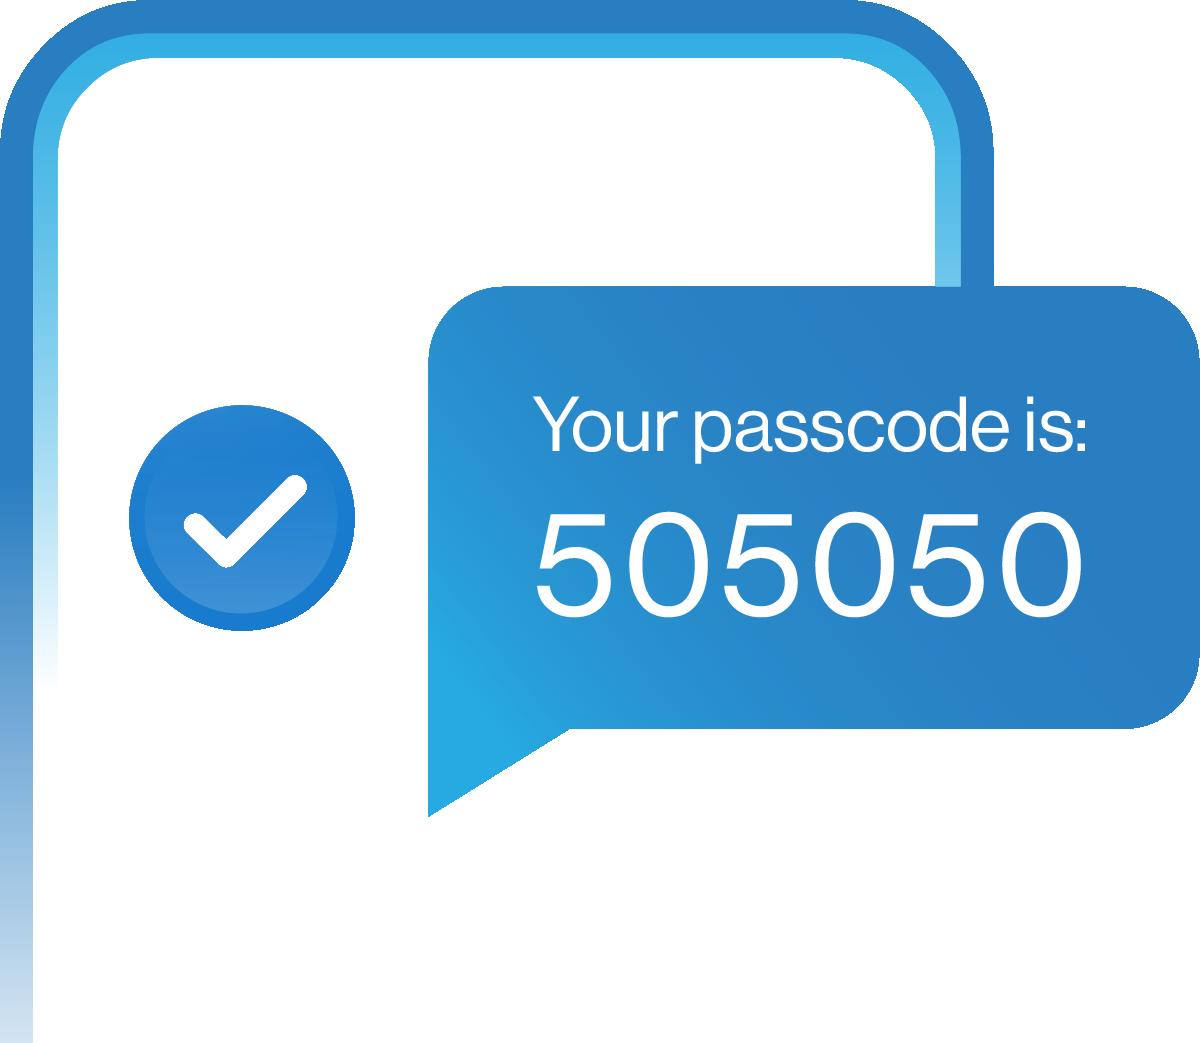 Verification code message